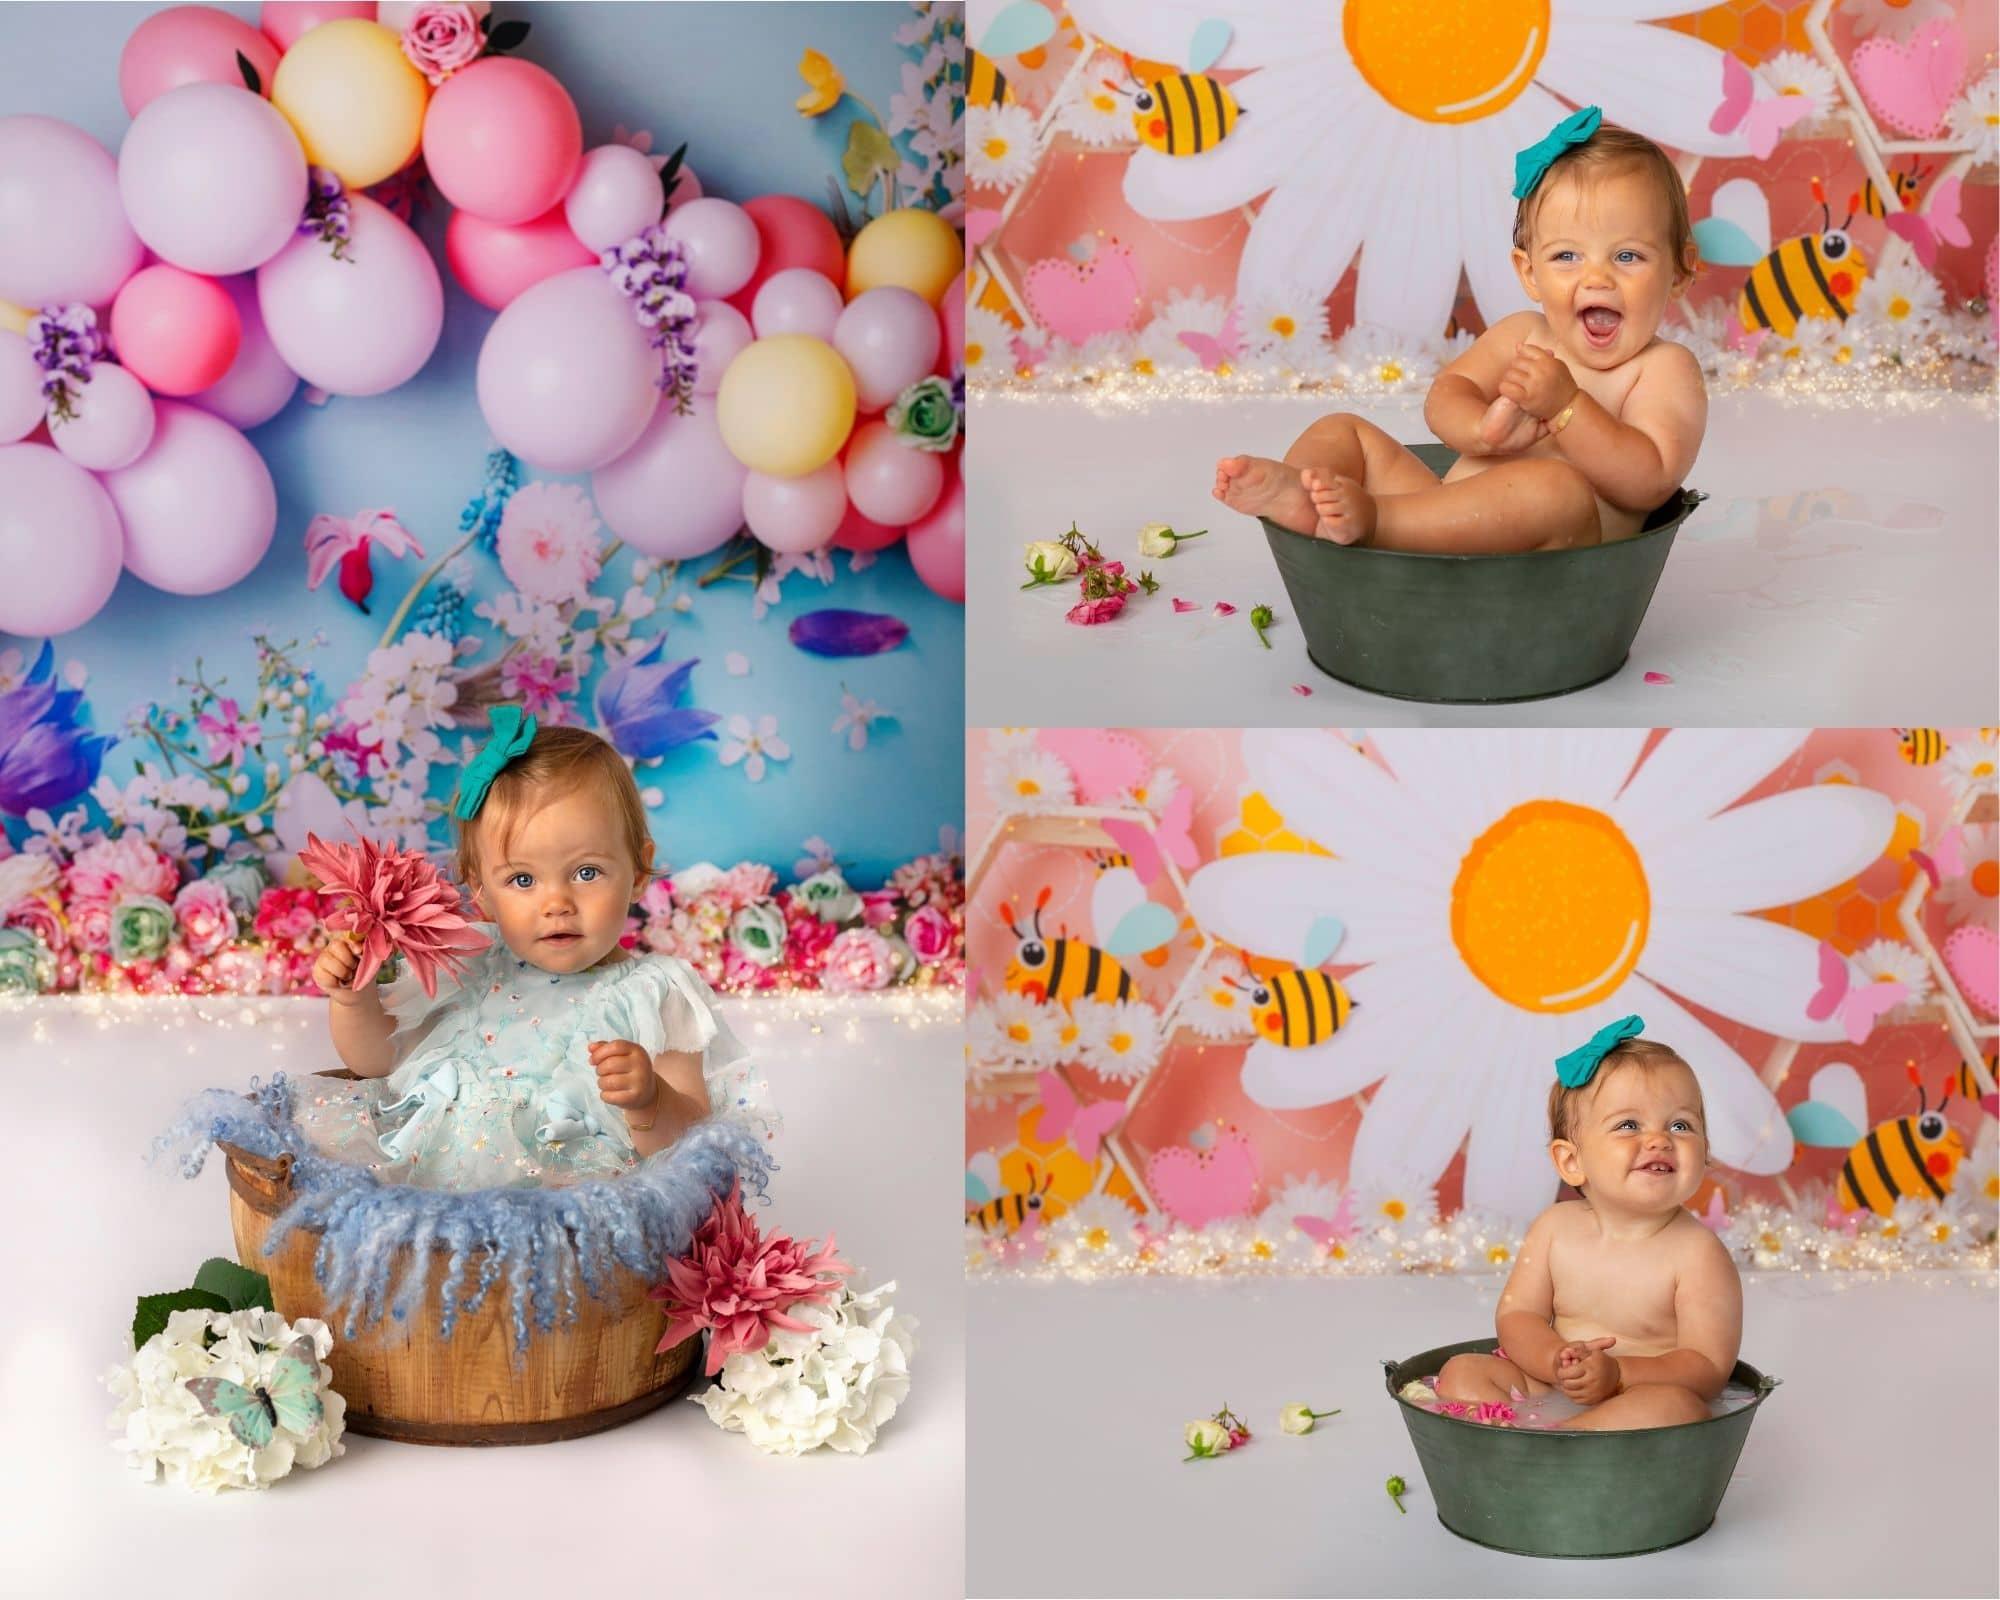 photographe-bebe-seance-smas-the-cake-strasbourg-clover-photographies-6